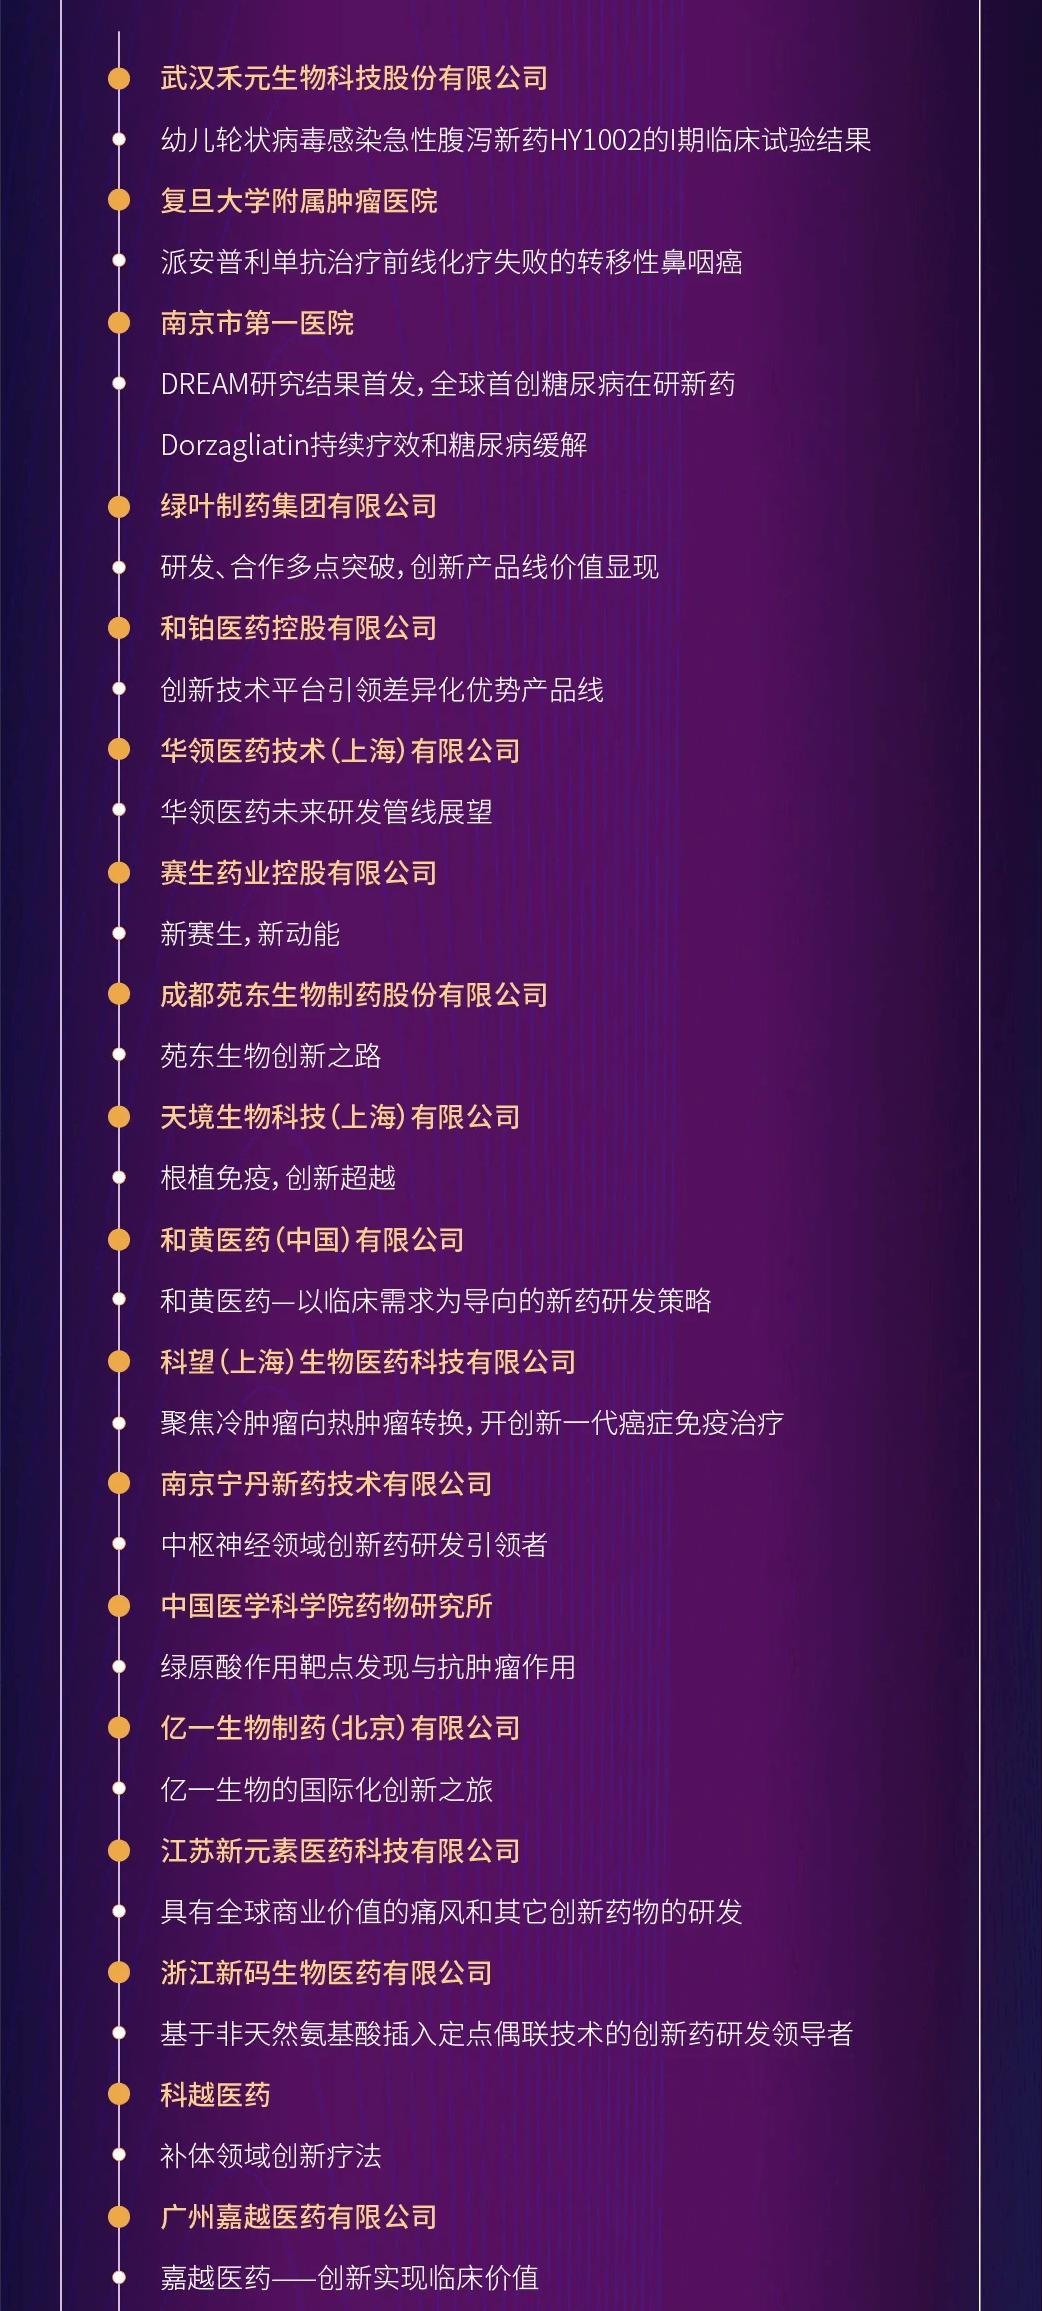 2021CBIIC第六届中国医药创新与投资大会